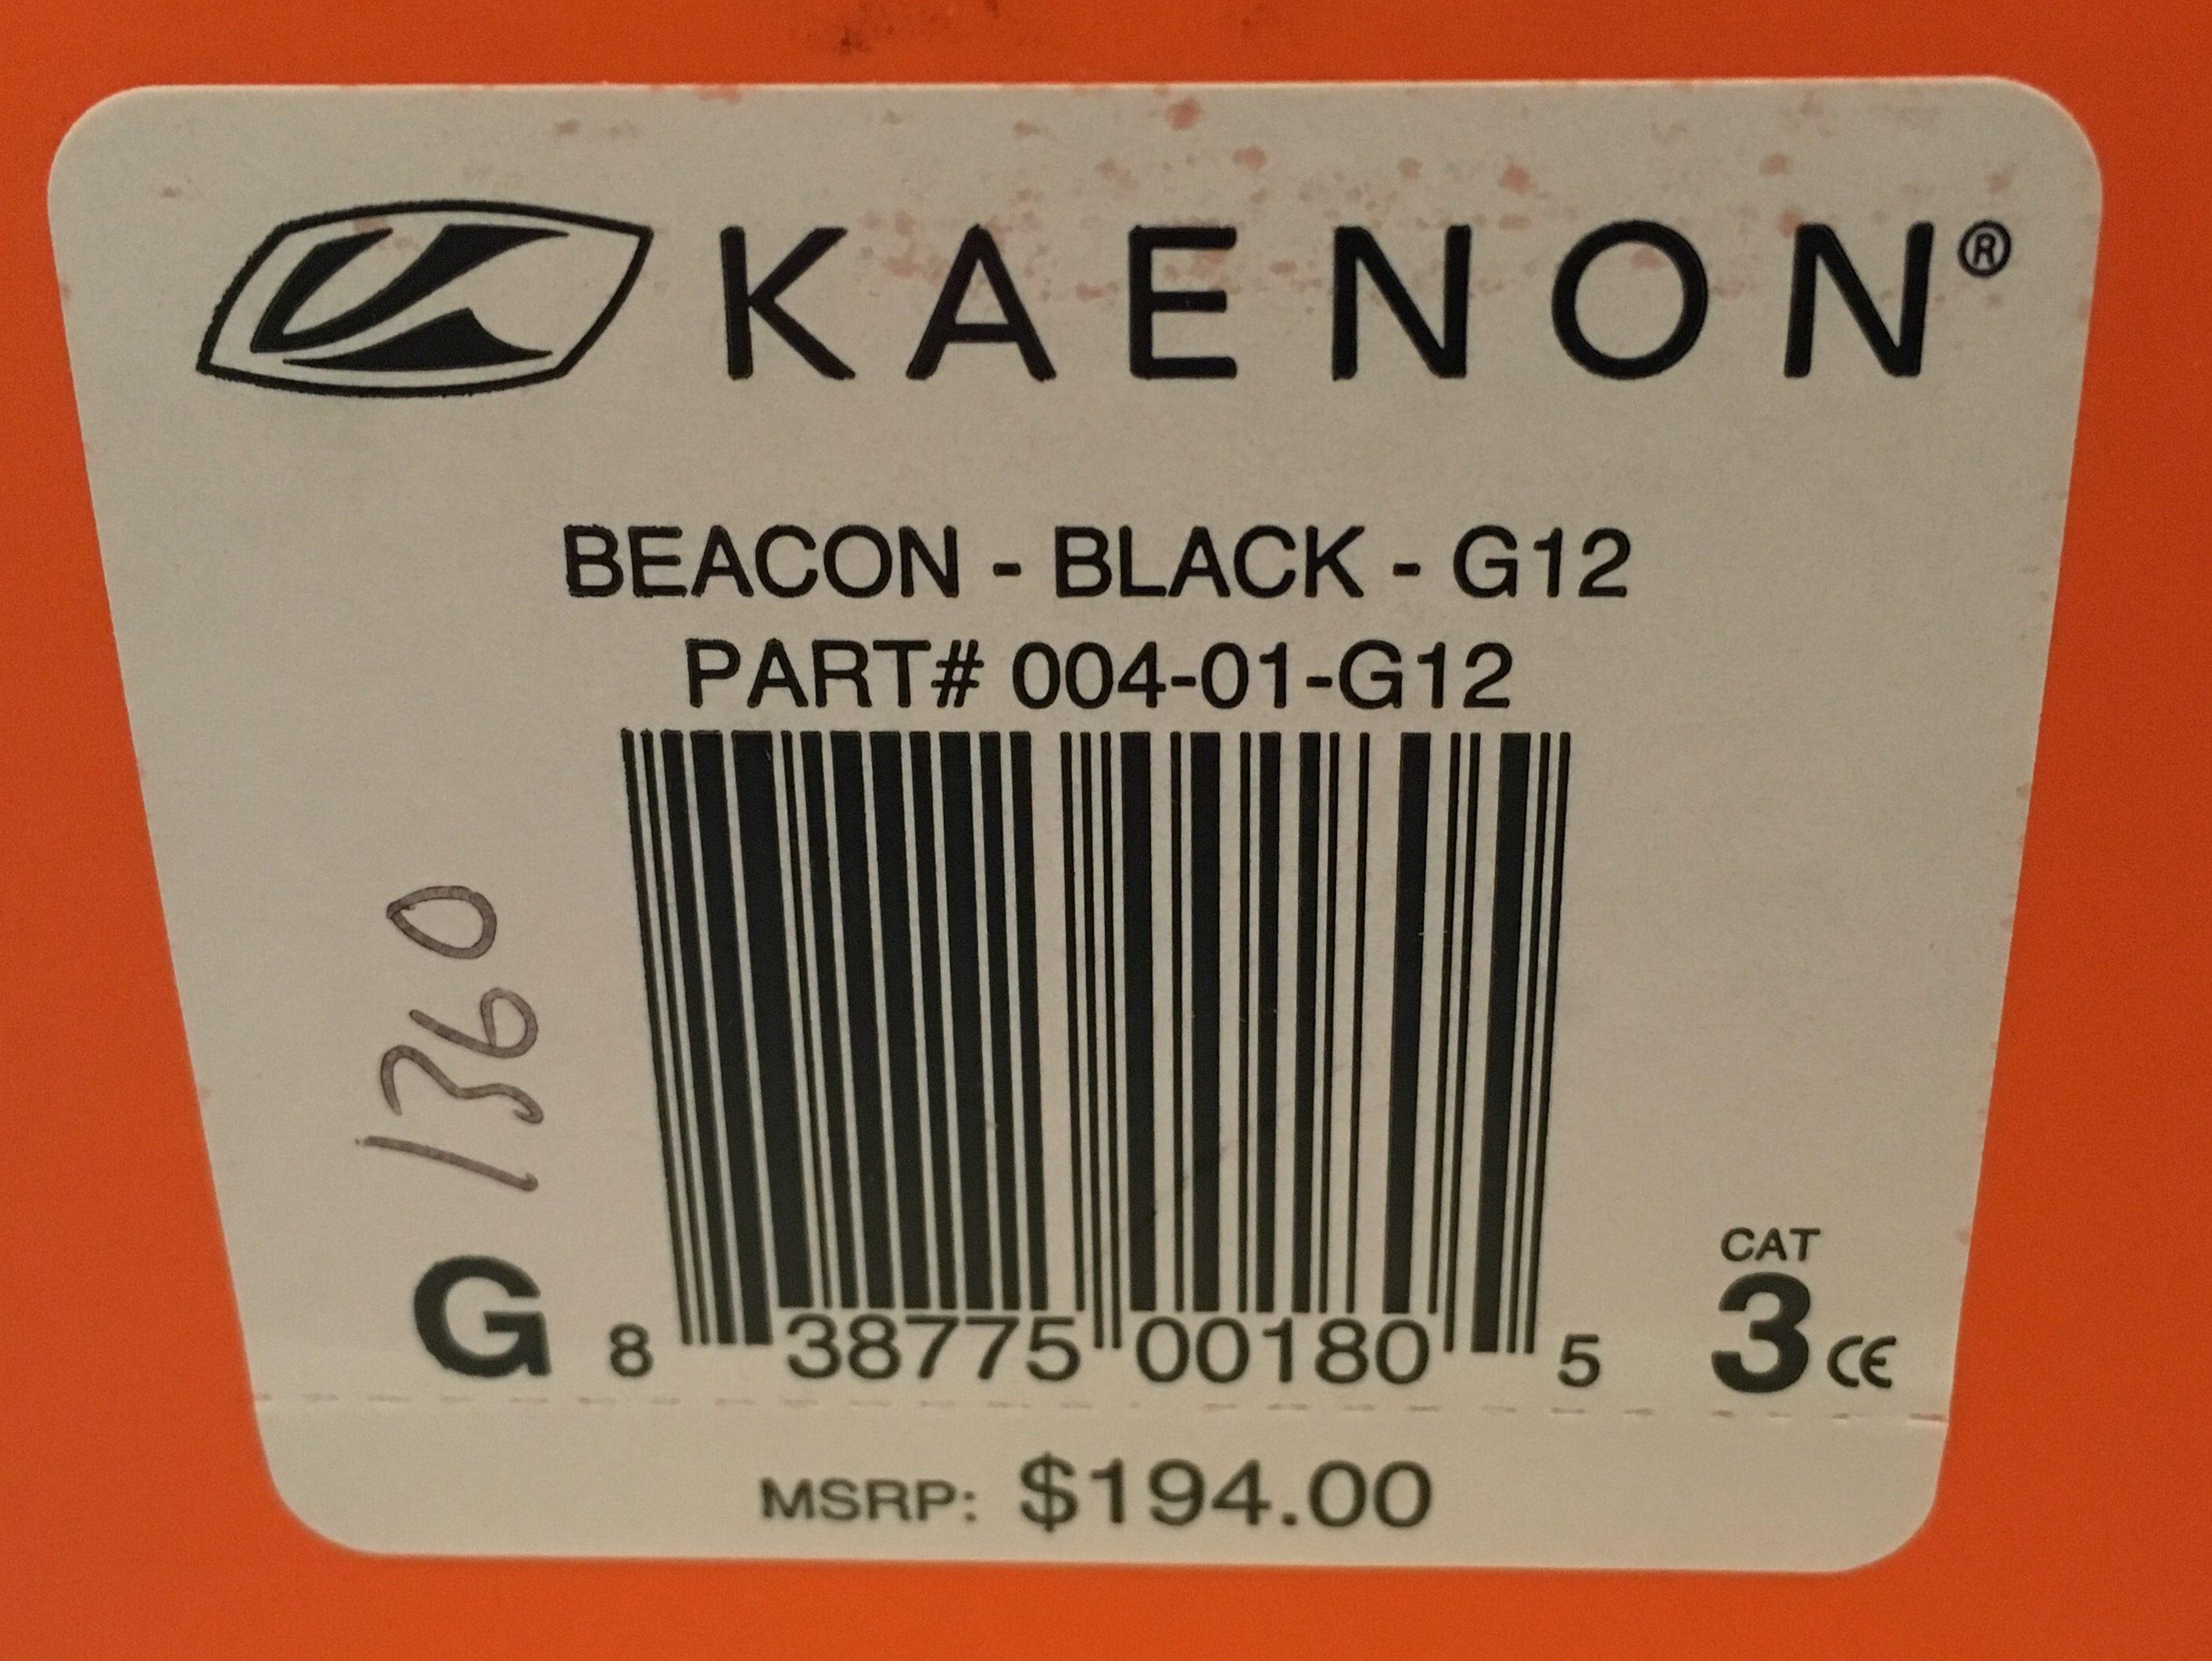 Kaenon Beacon Sunglasses - Black Frame - POLARIZED G12 Gray Lens